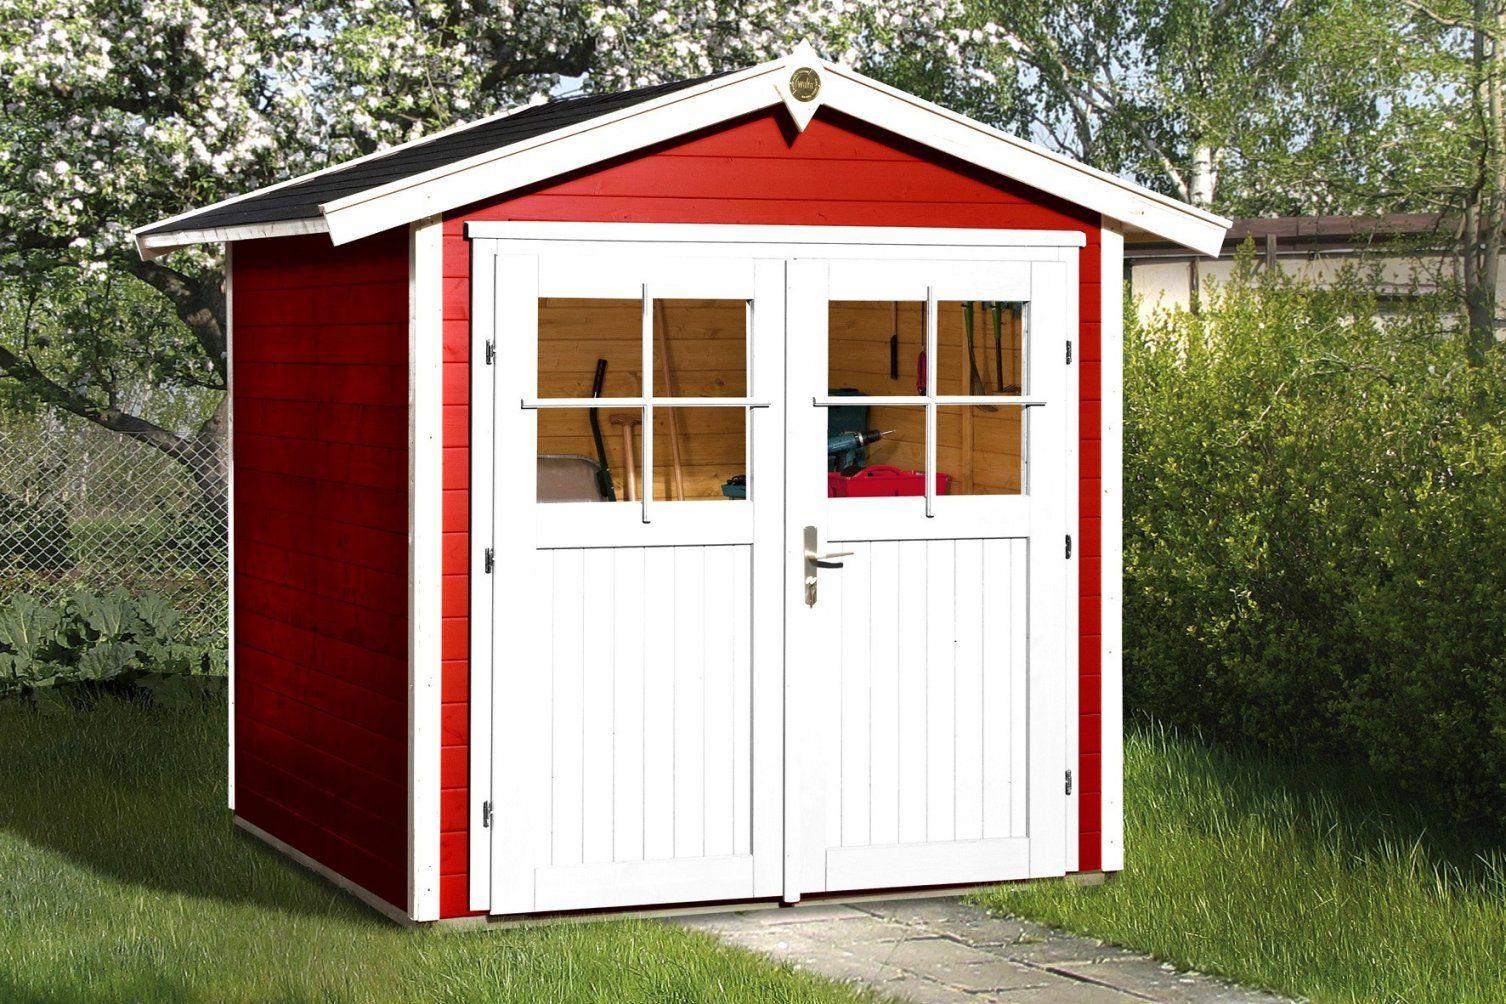 anleitung gartenhaus free gartenhaus with anleitung gartenhaus stunning ein selber zu bauen. Black Bedroom Furniture Sets. Home Design Ideas